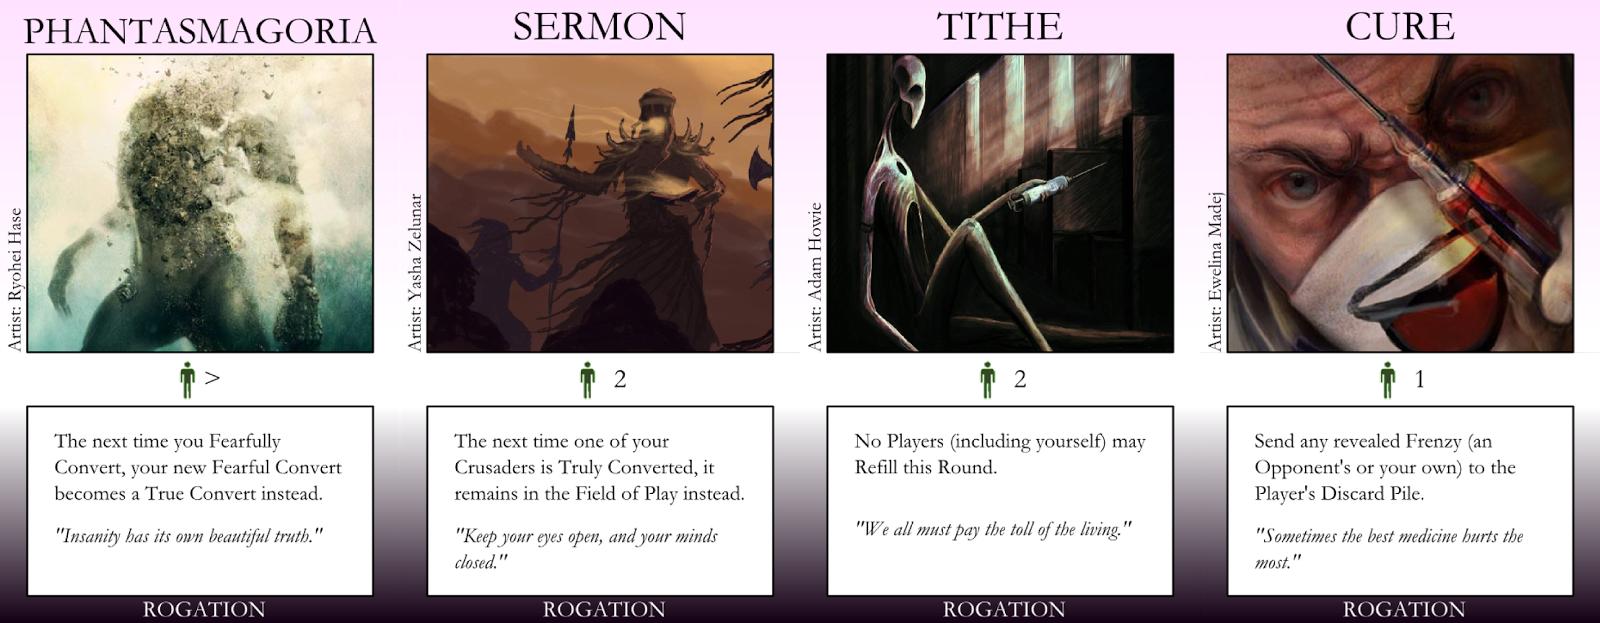 Phatasmagoria, Sermon, Tithe, Cure